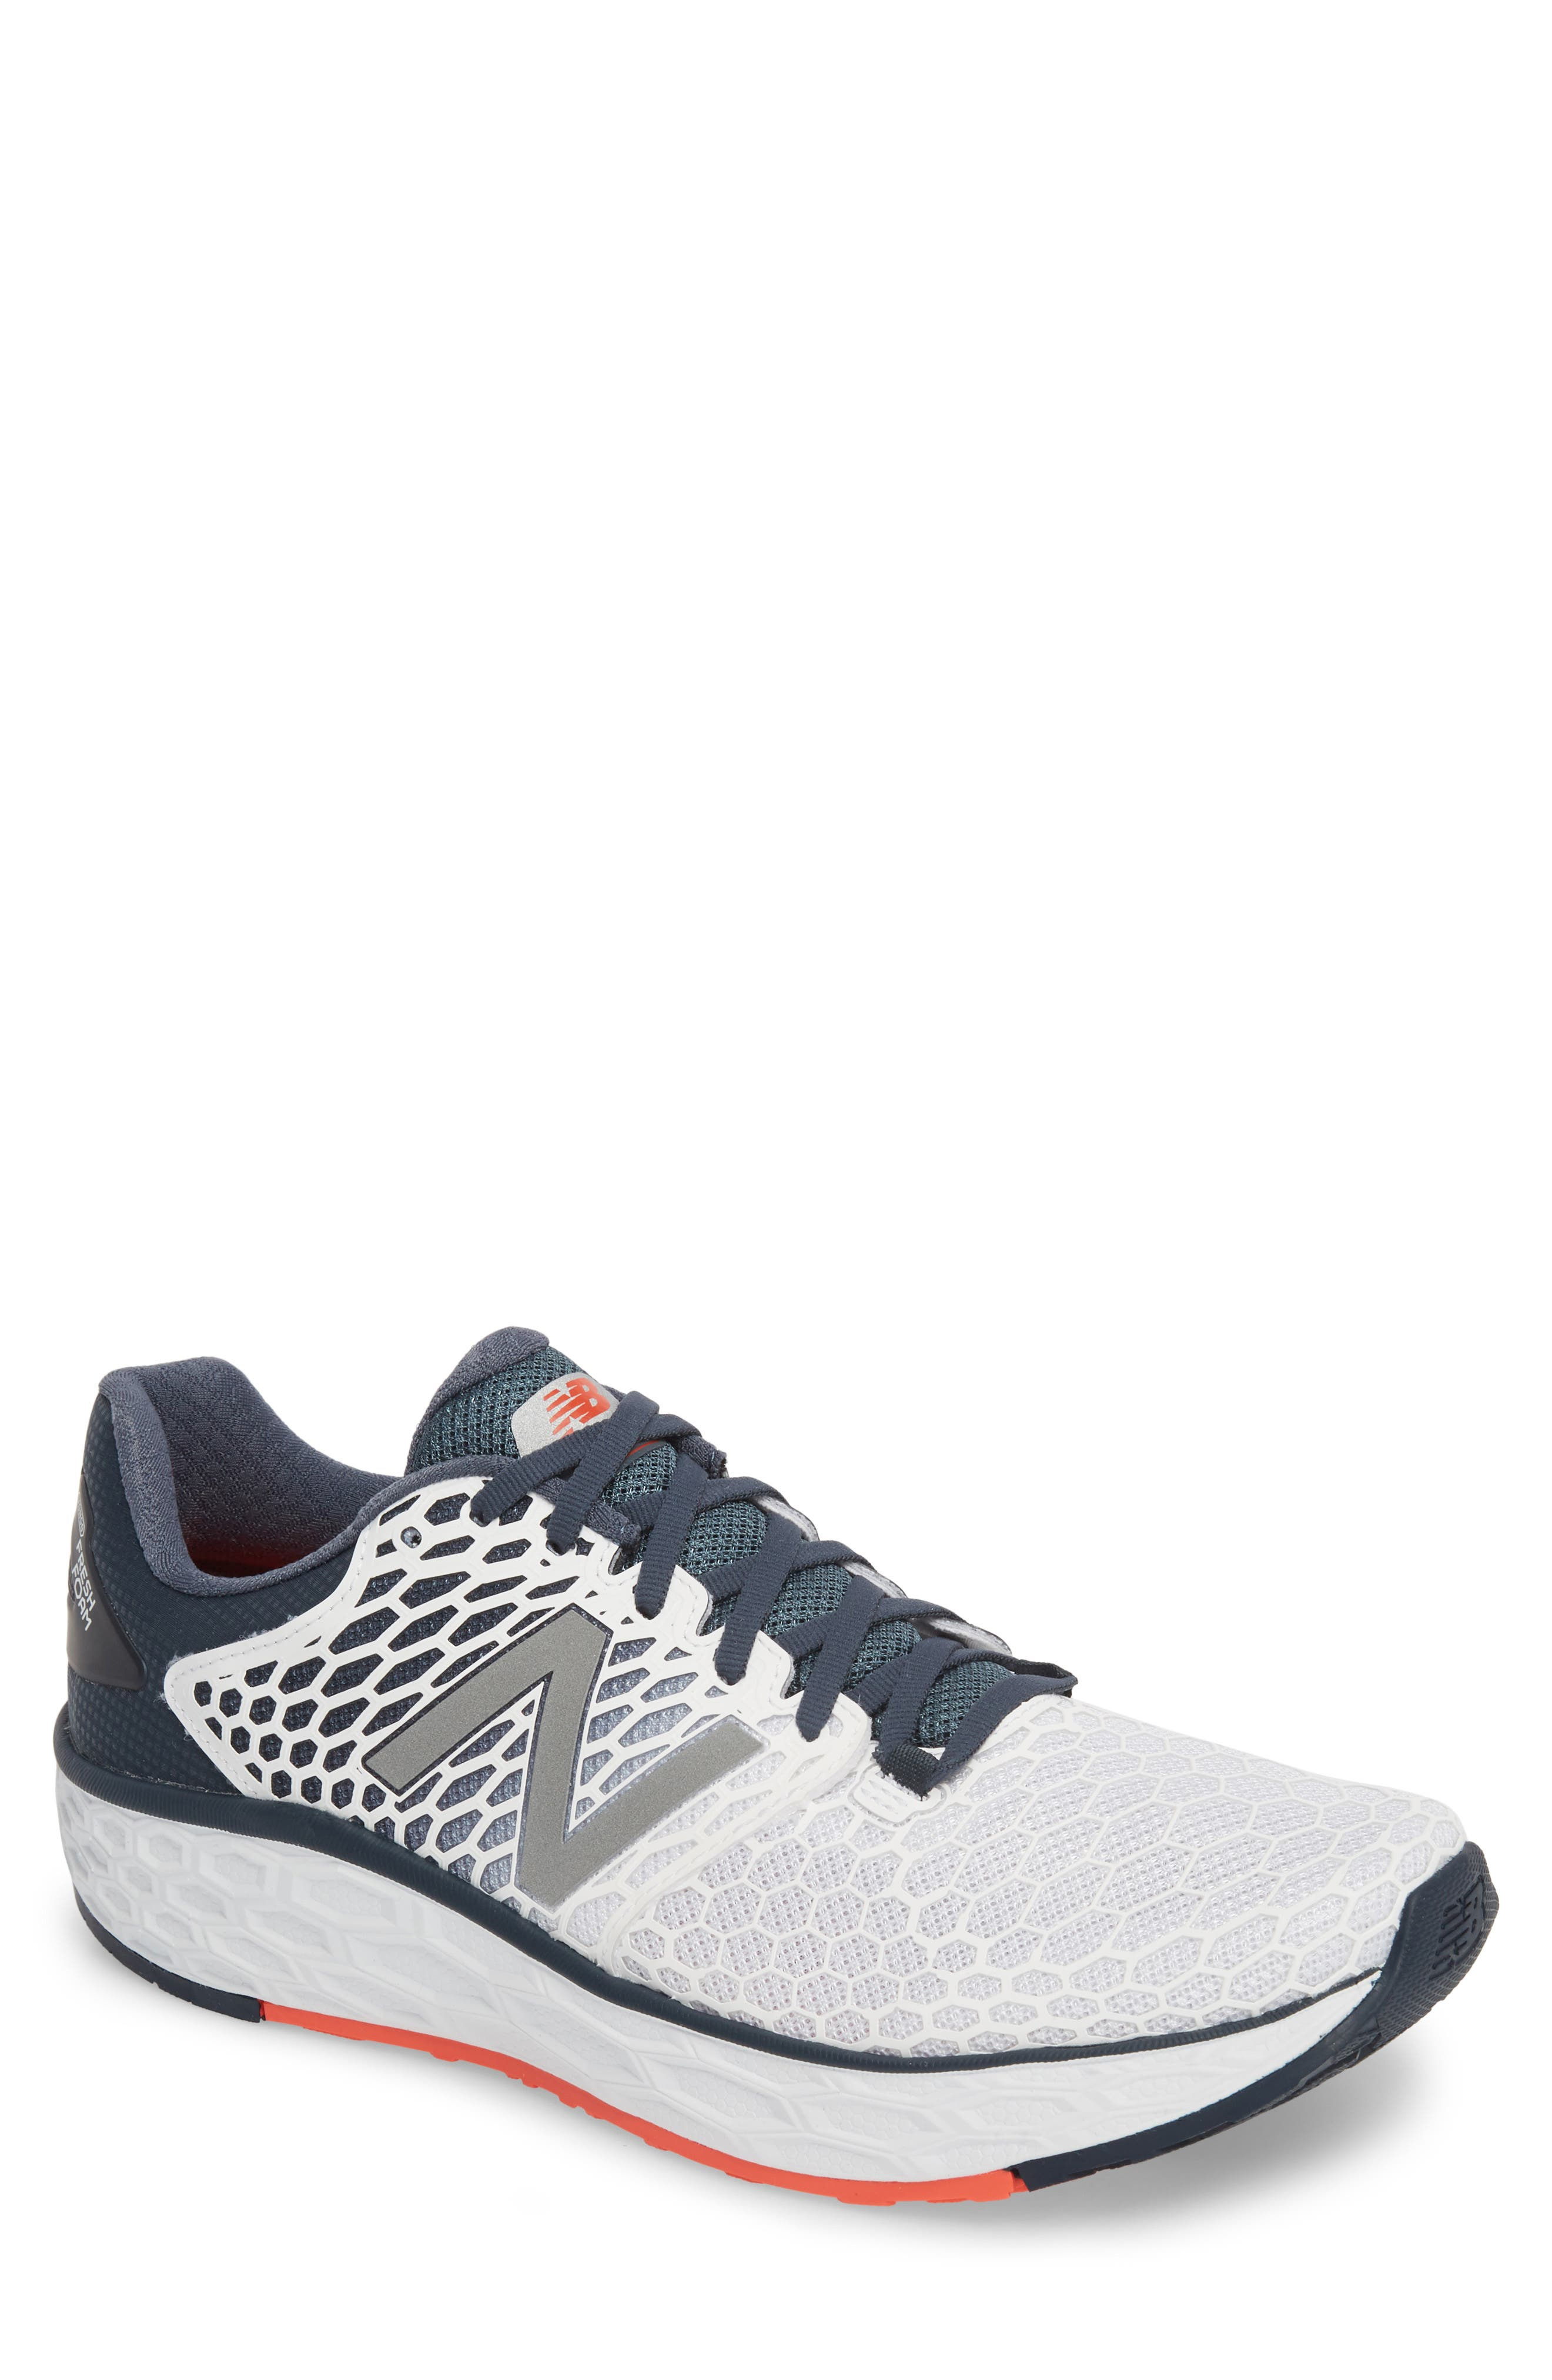 Fresh Foam Vongo v3 Running Shoe,                         Main,                         color, White